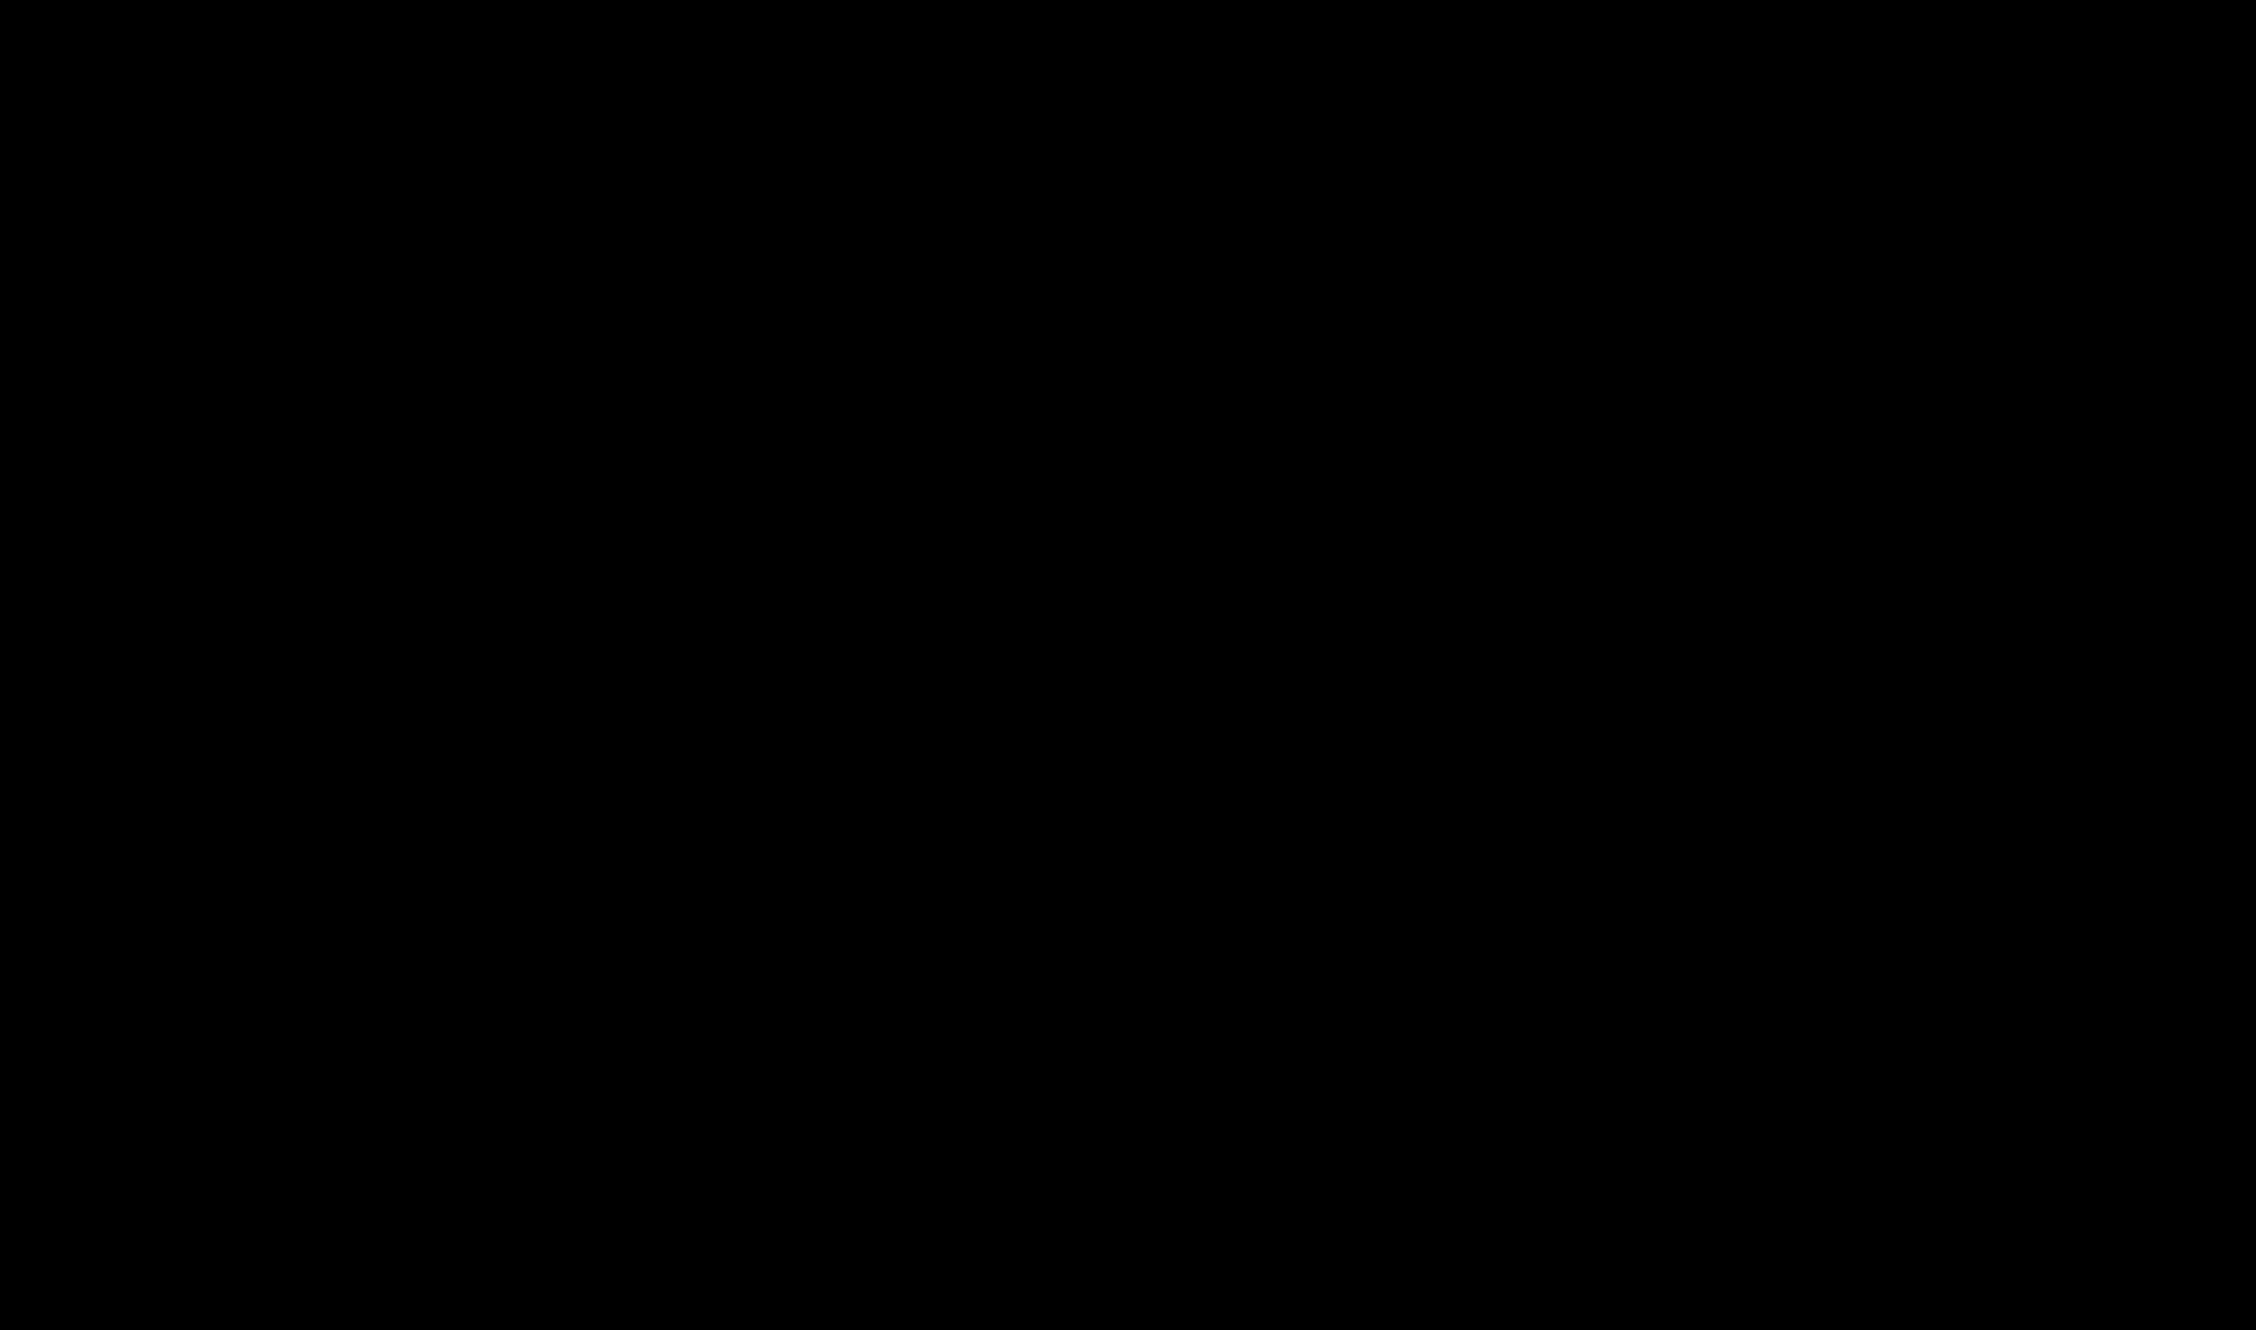 Silhouette at getdrawings com. Dinosaur clipart spinosaurus